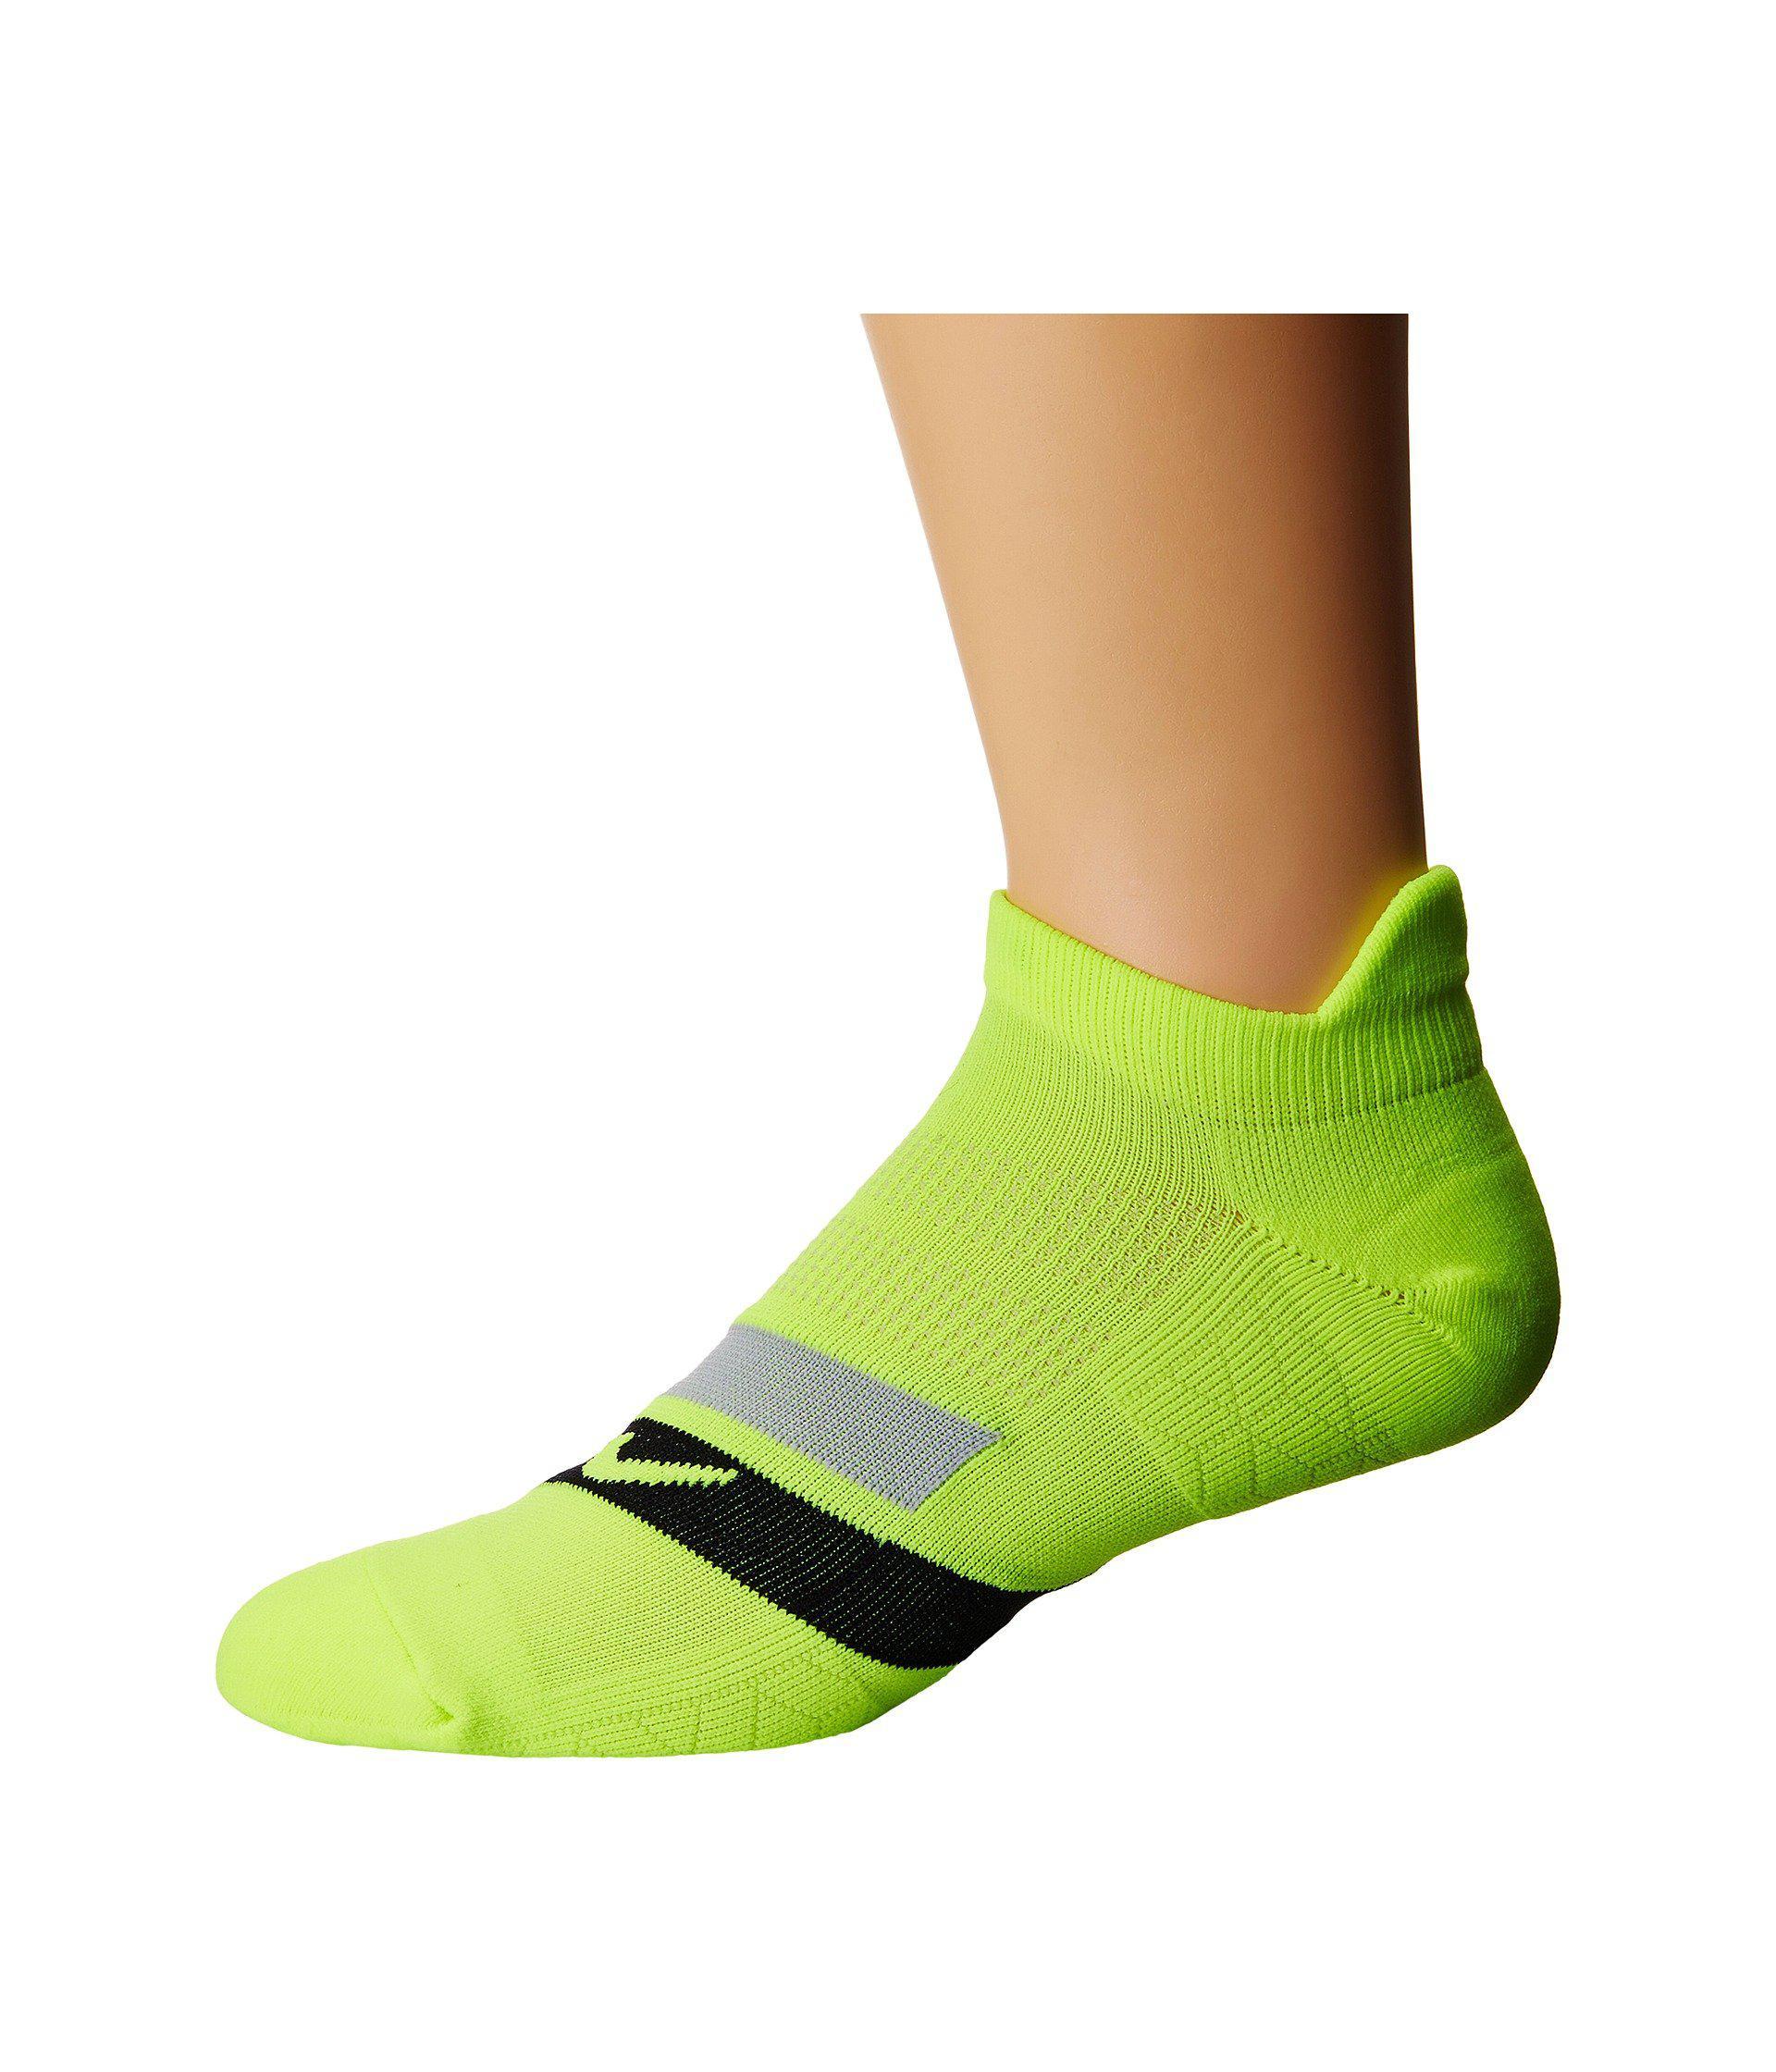 info for 914f7 2093f Nike. Women s Green Dri-fit Cushion Dynamic Arch No-show Running Socks